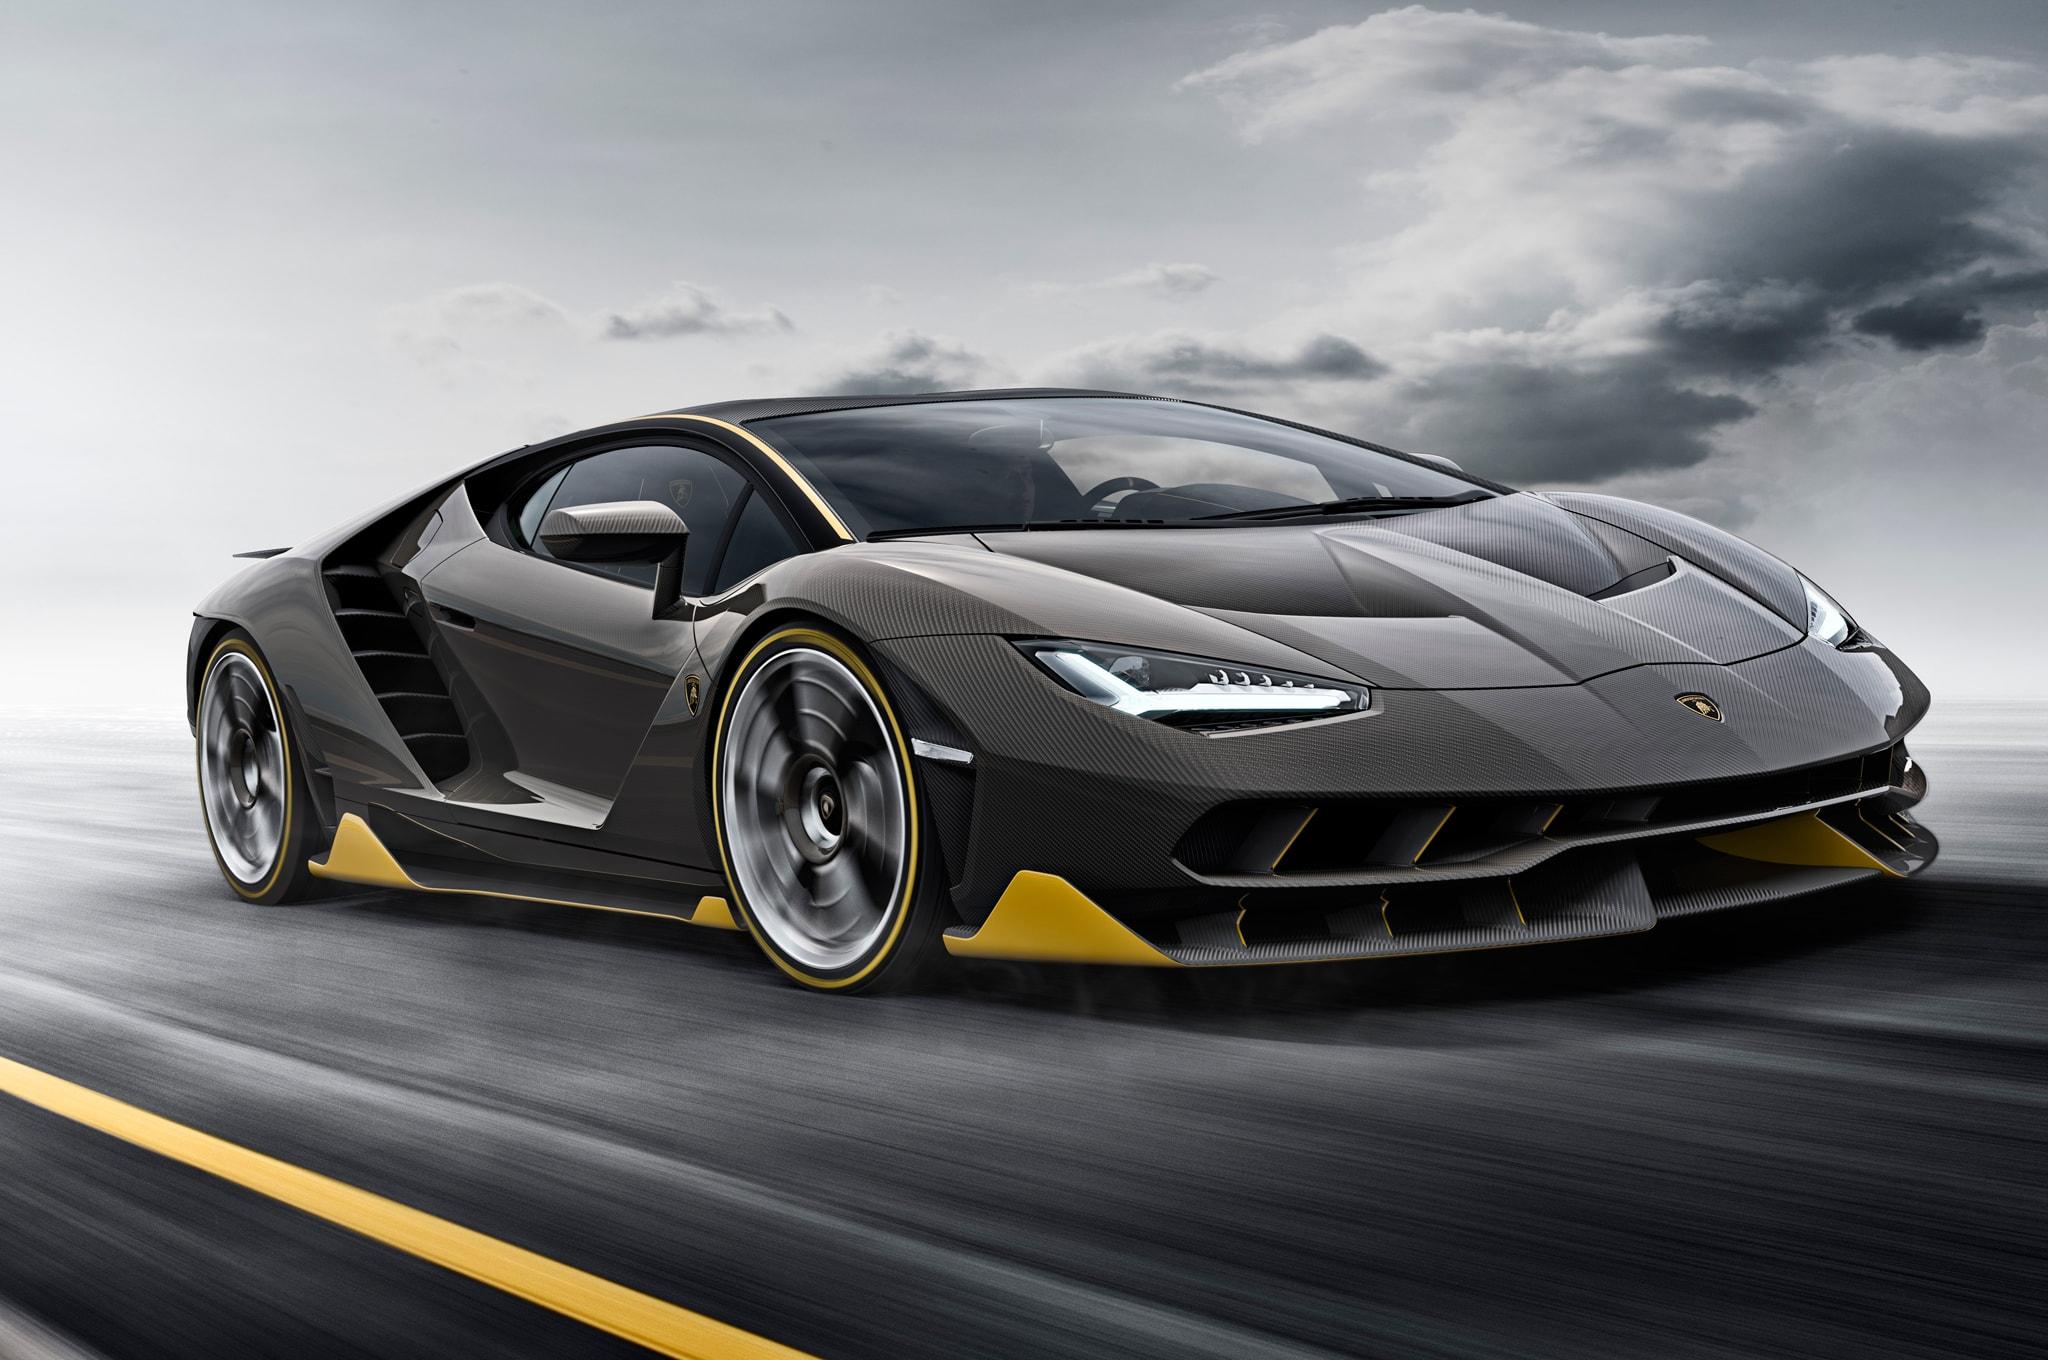 gd, bigbang gd, g dragon, gd car, gd property, g dragon car, g dragon Lamborghini Aventador ,